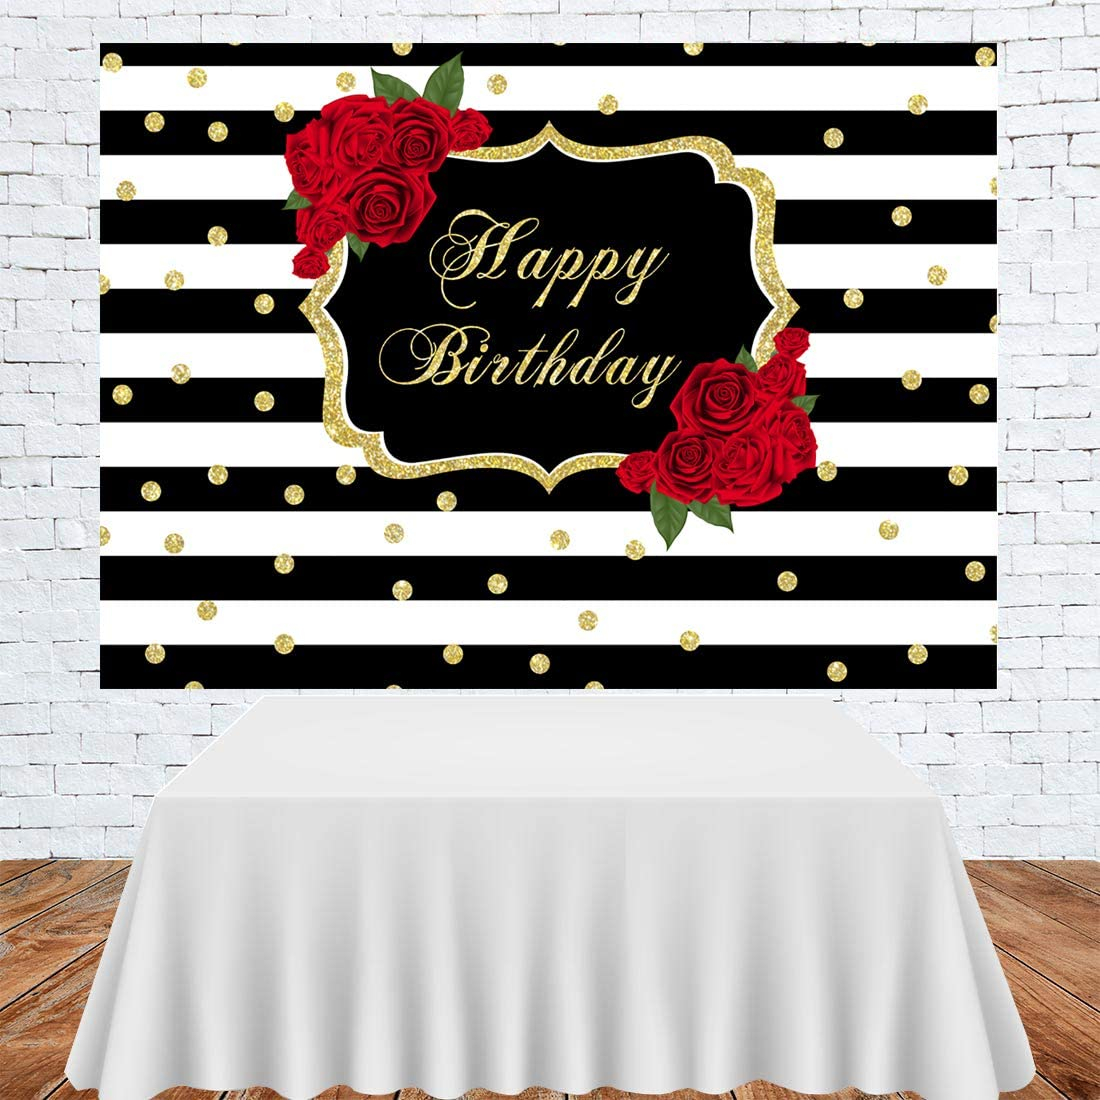 8x6.5ft Happy Birthday Backdrop Black and White Stripes Vinyl Photography Background Red Rose Golden Edge Brand Girls Children Kids Family Party Decor Portrait Shoot Studio Props